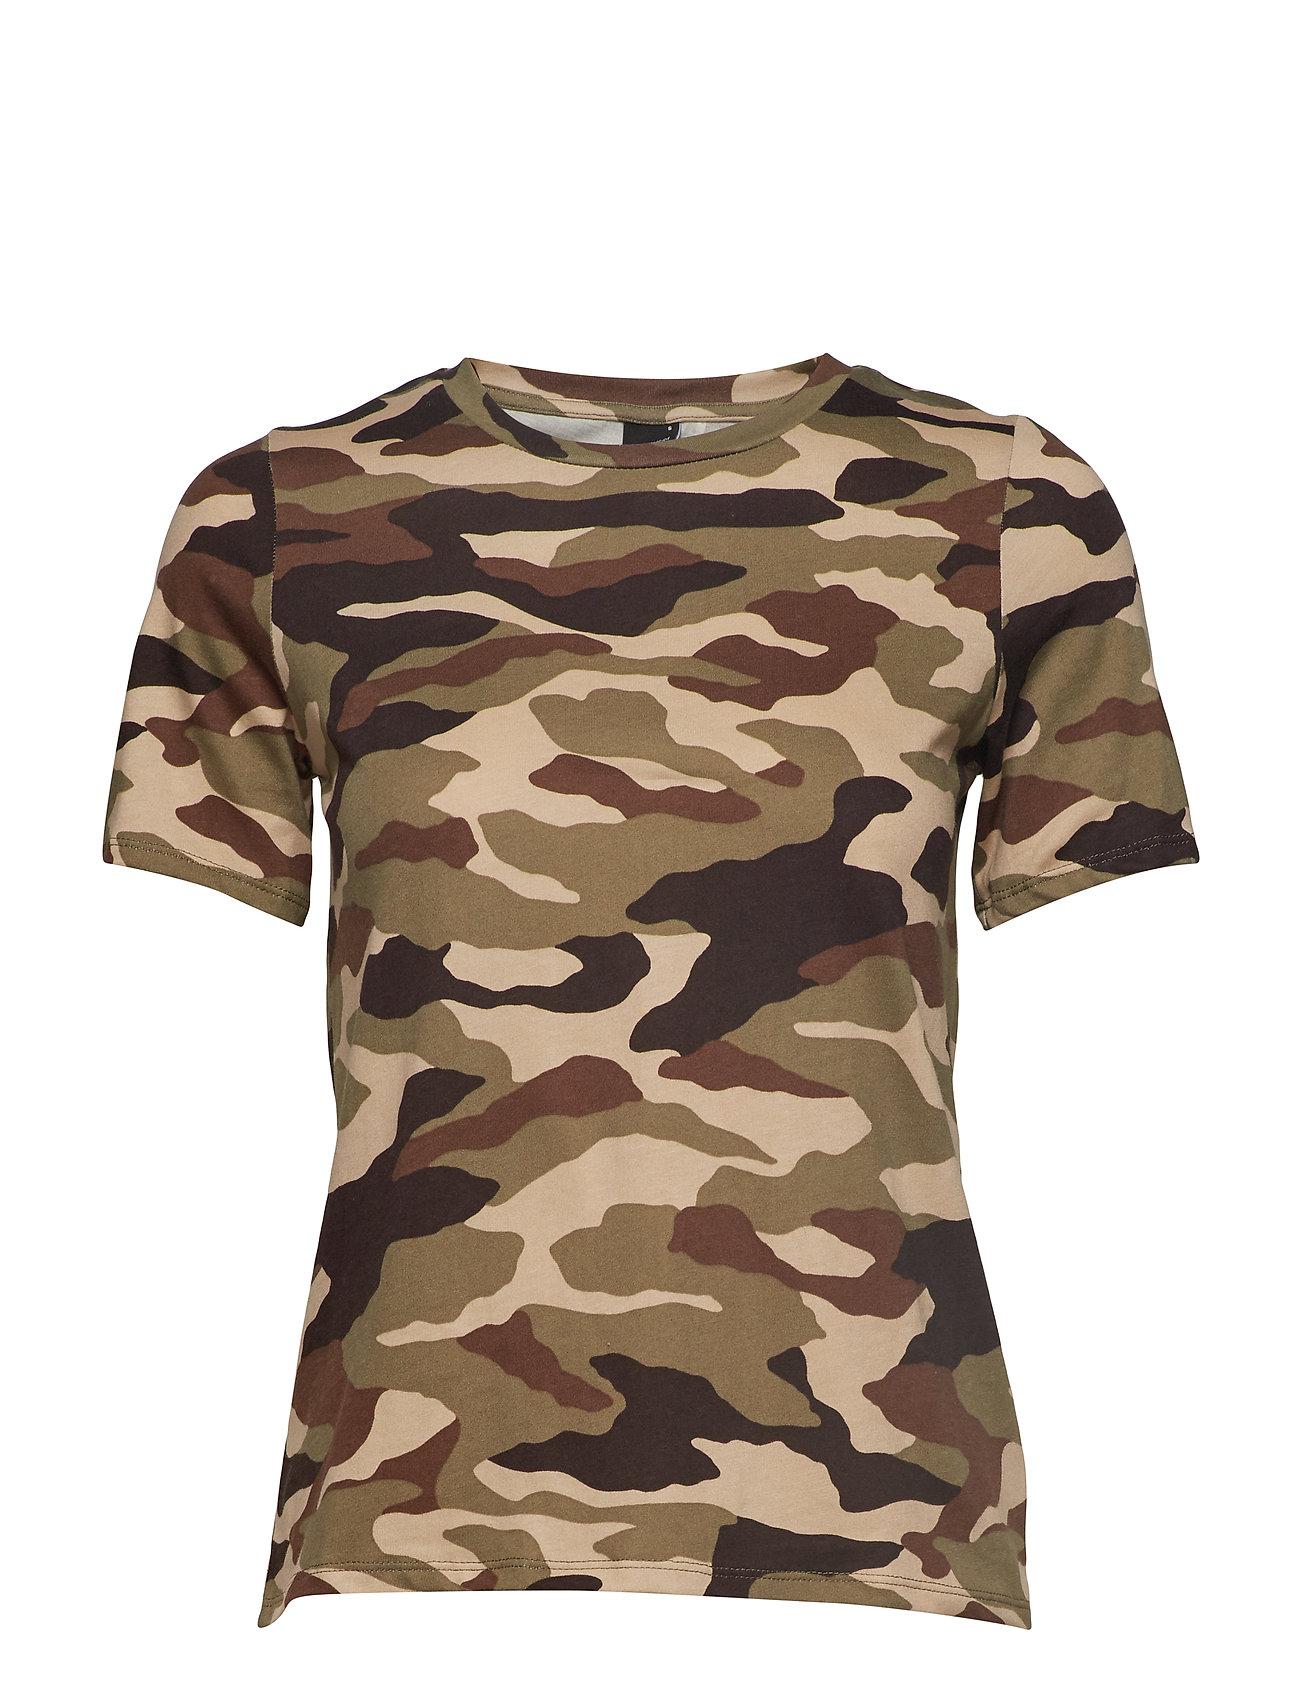 Cleo Tee T shirt Top Grøn GINA TRICOT